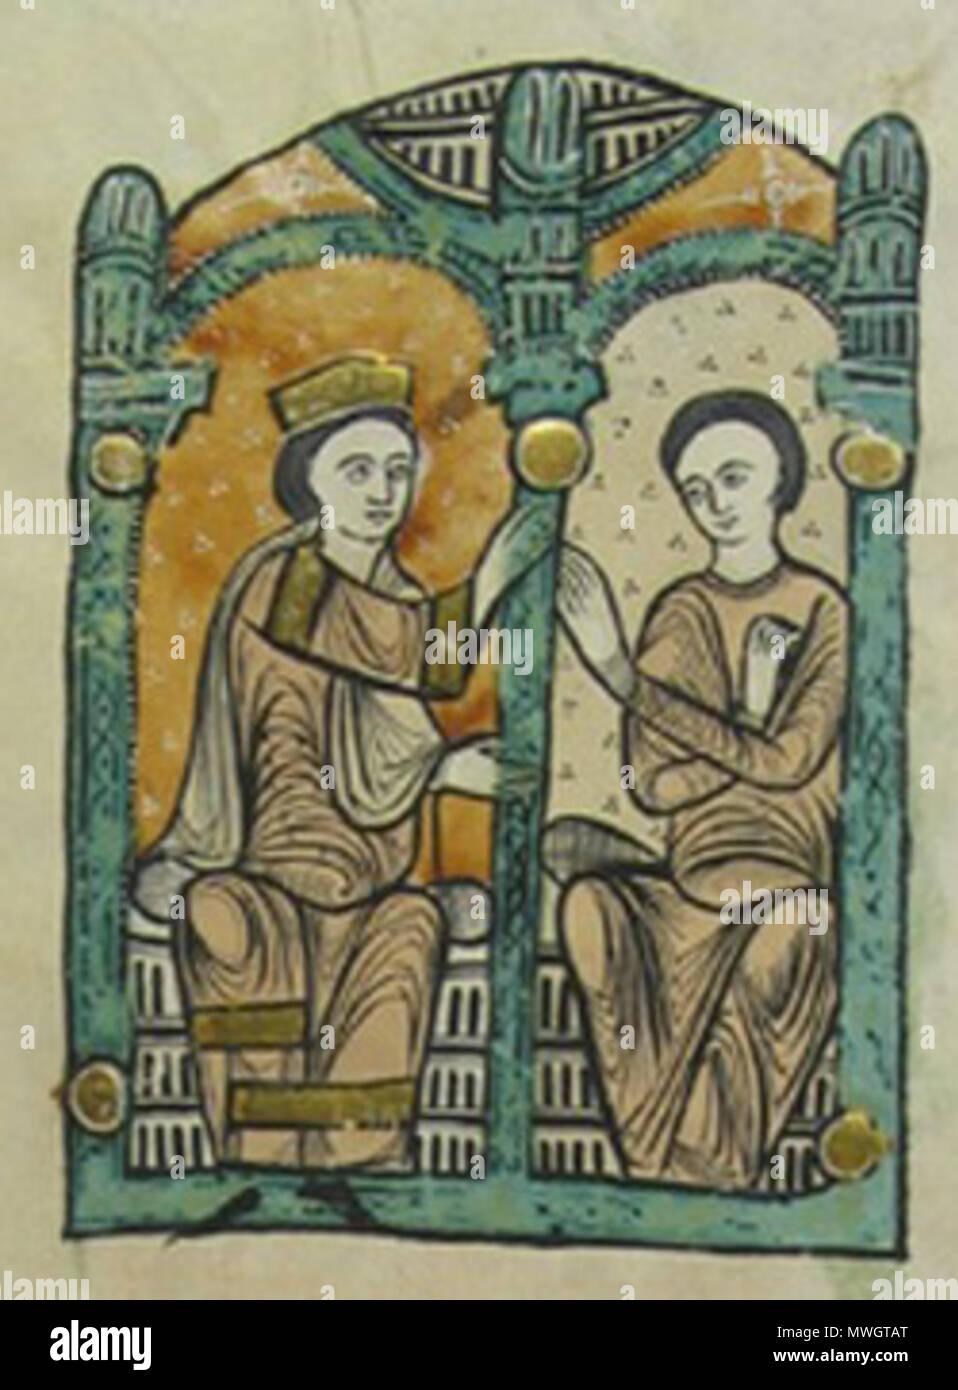 Englisch: Liber Feudorum Maior - Miniatur illustrieren den